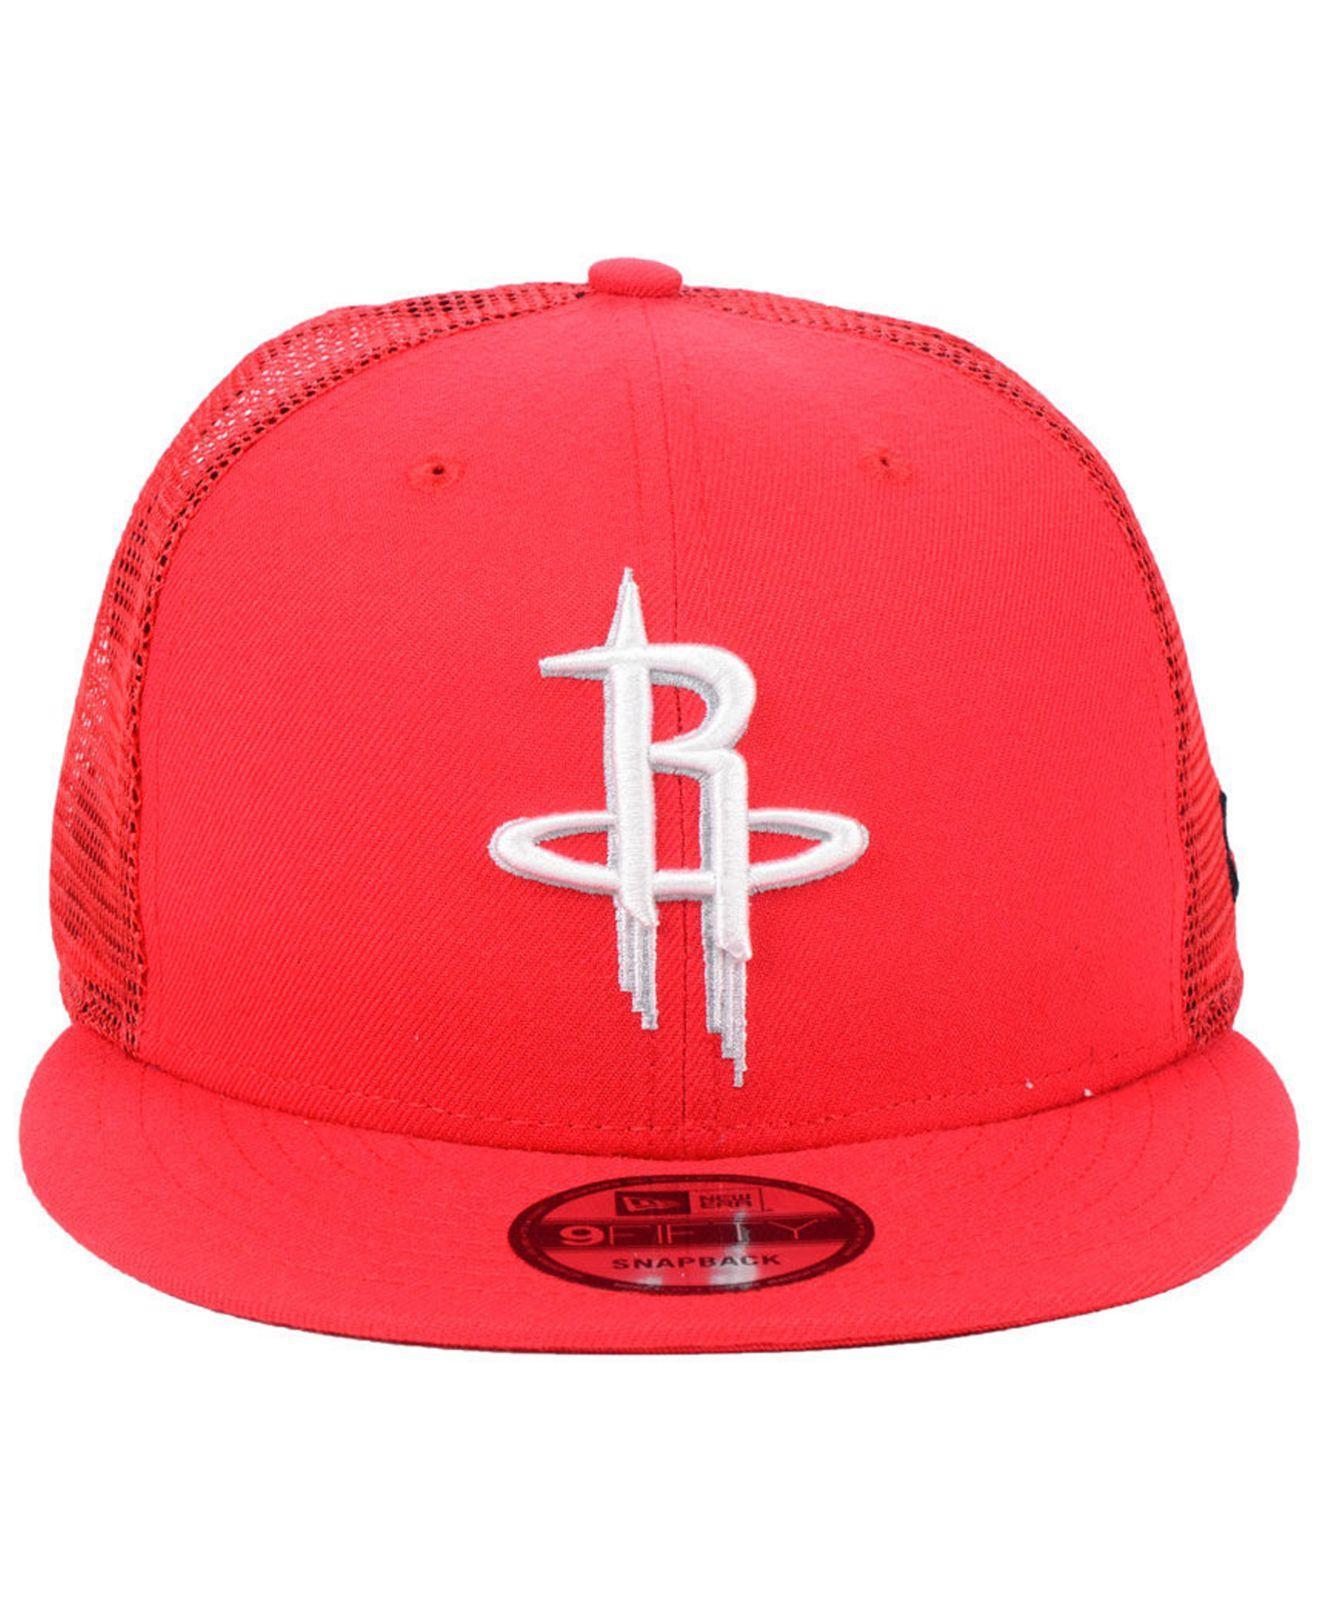 39b5cbf83cb Lyst - KTZ Houston Rockets Nothing But Net 9fifty Snapback Cap in Red for  Men